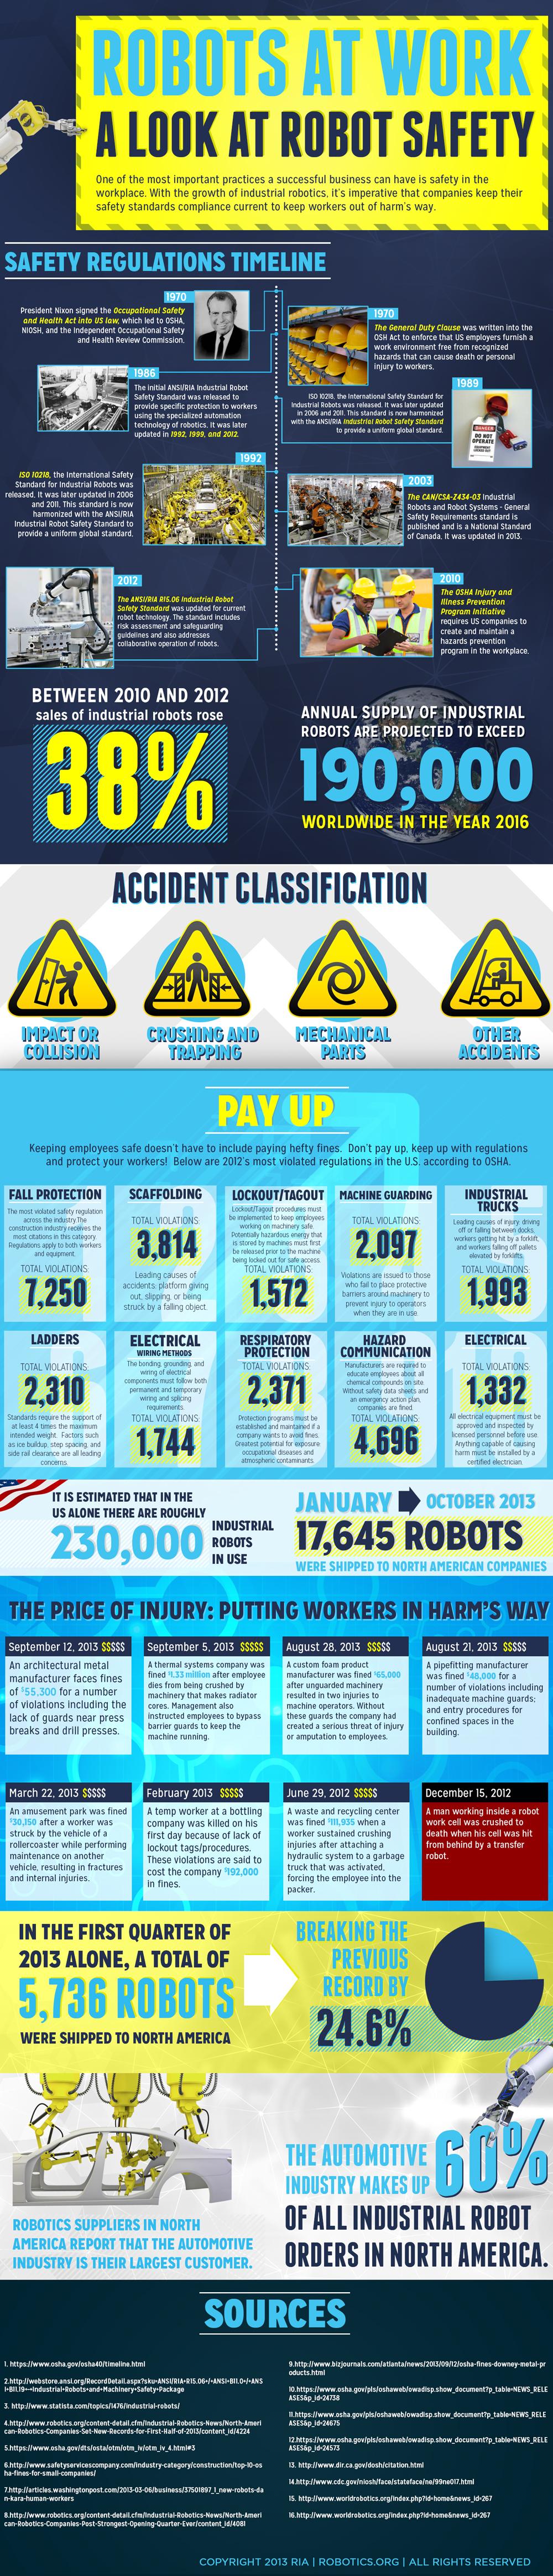 robotics-infographic-final-2